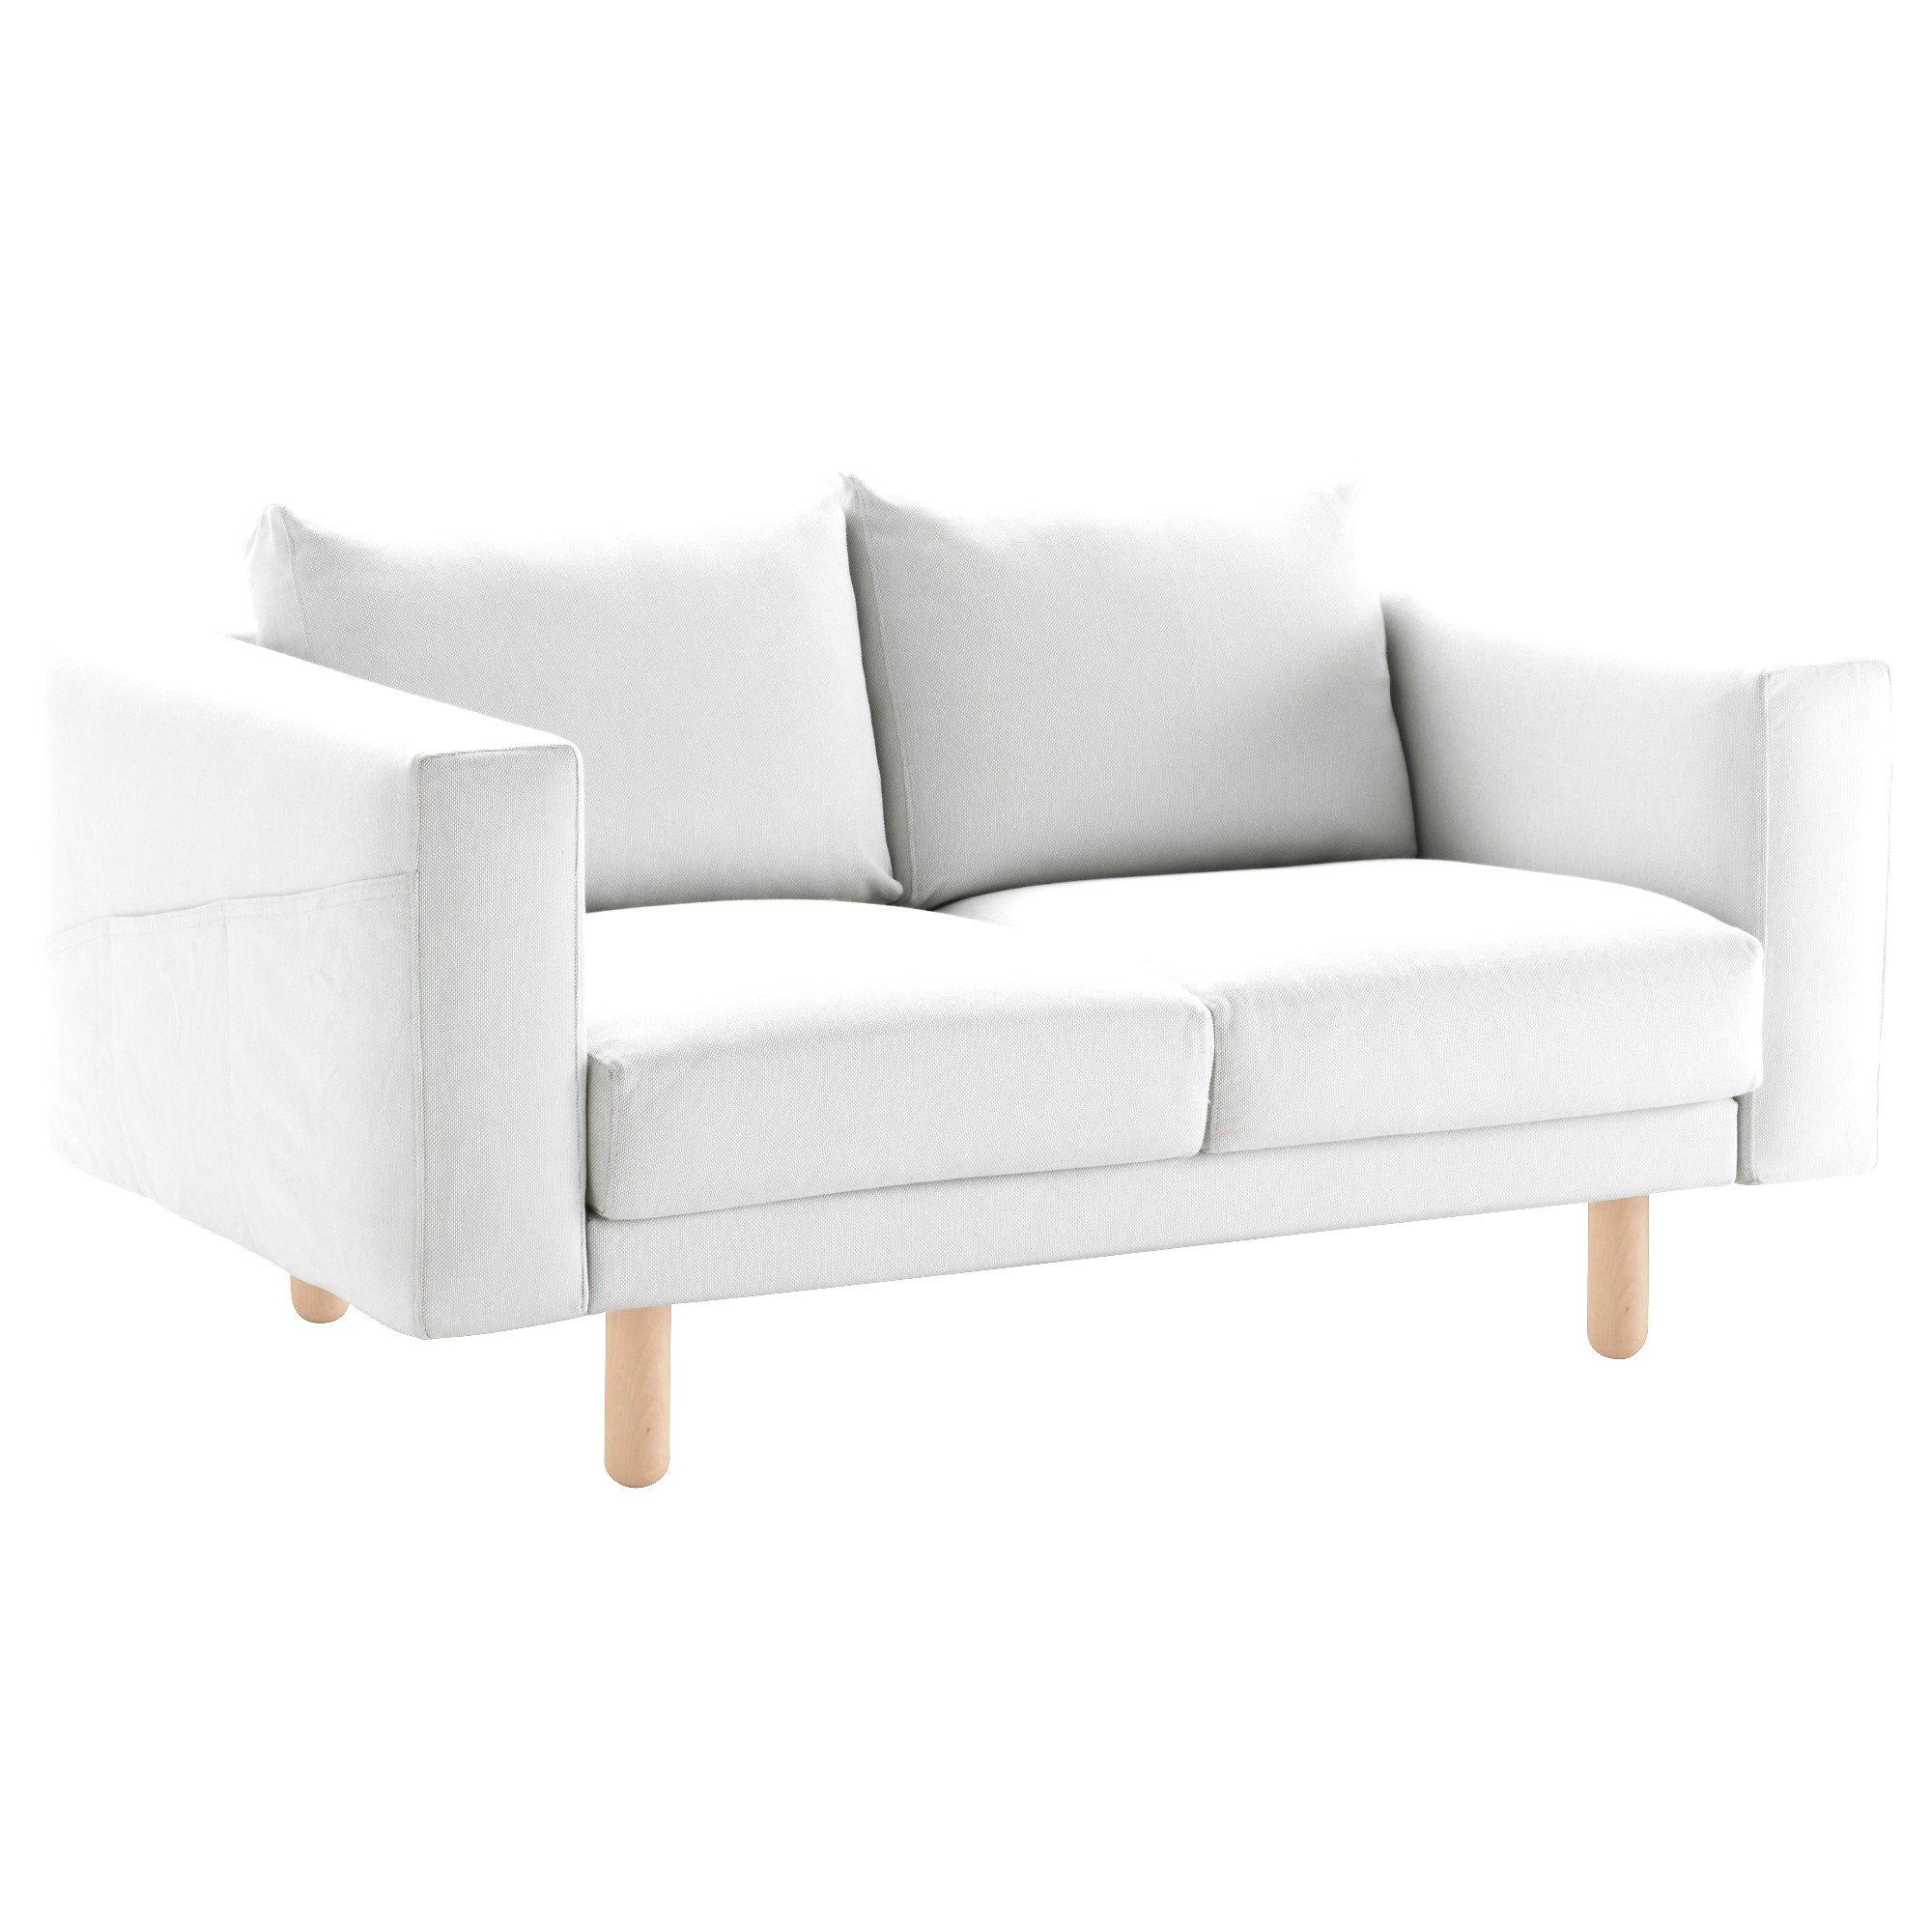 Pouf Lit Ikea Génial Chauffeuse Convertible Ikea Avec Bz 1 Place Ikea Gallery Luxury